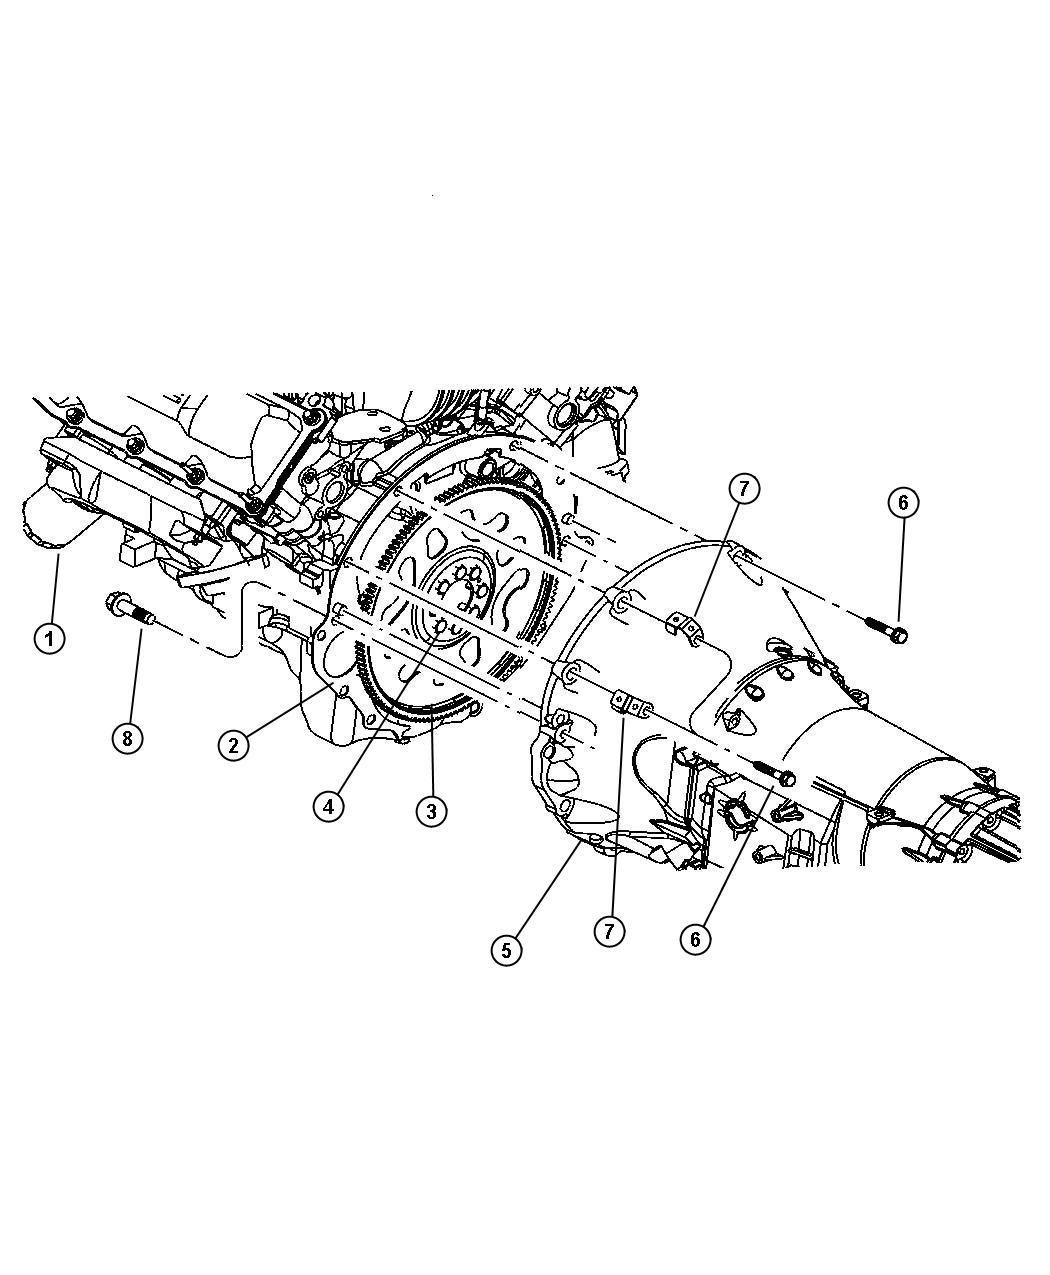 tags: #jeep cherokee 4 0 wiring harness sport#jeep 4 2 to 4#hesco wiring  harness#jeep 4#89 jeep yj wiring diagram#93 jeep yj wiring diagrams#97 jeep  grand